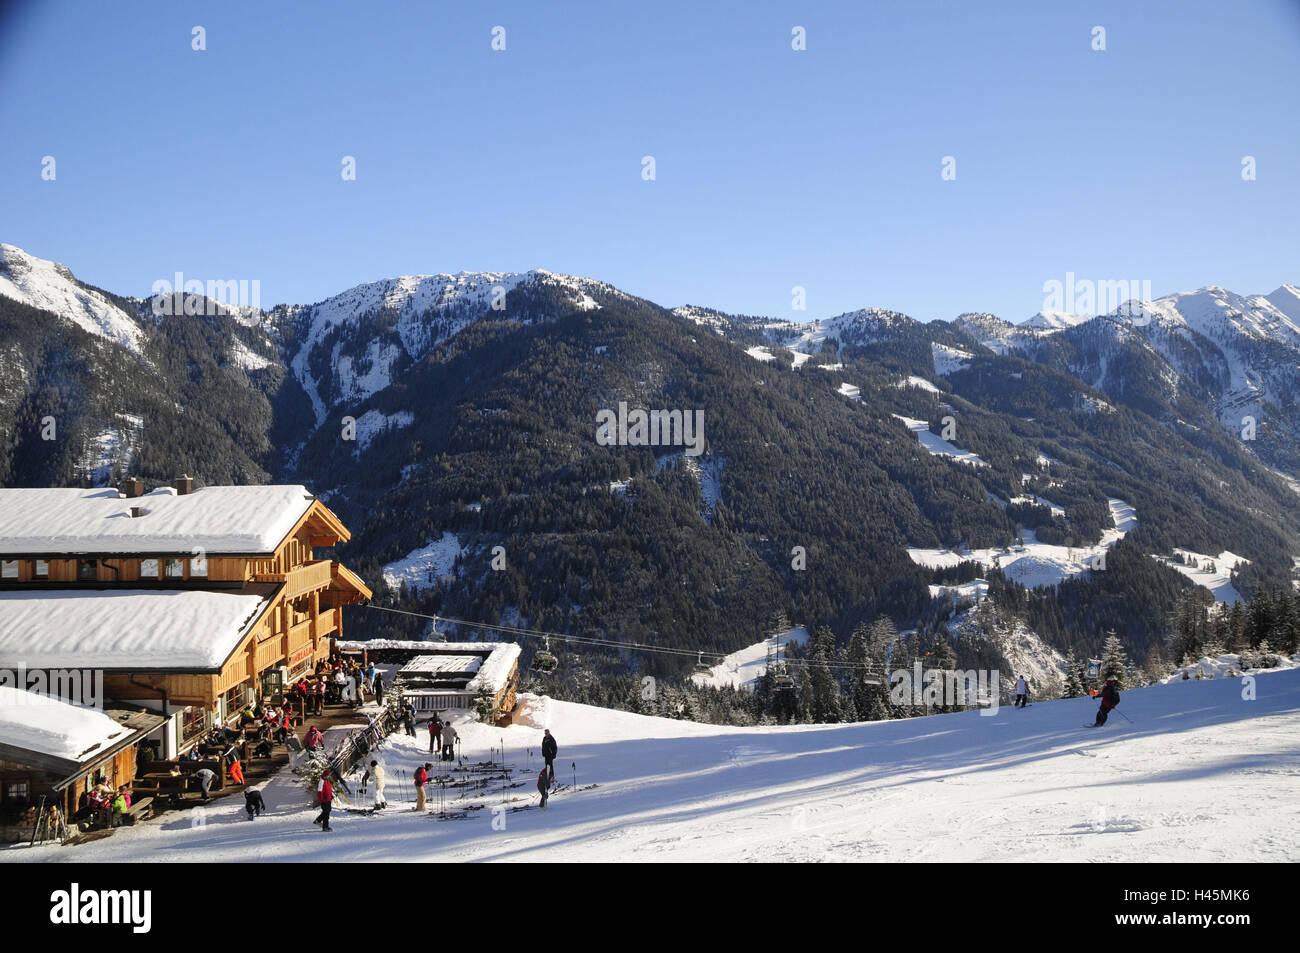 austria, salzburg country, skiing area flachauwinkel, flachau, ski